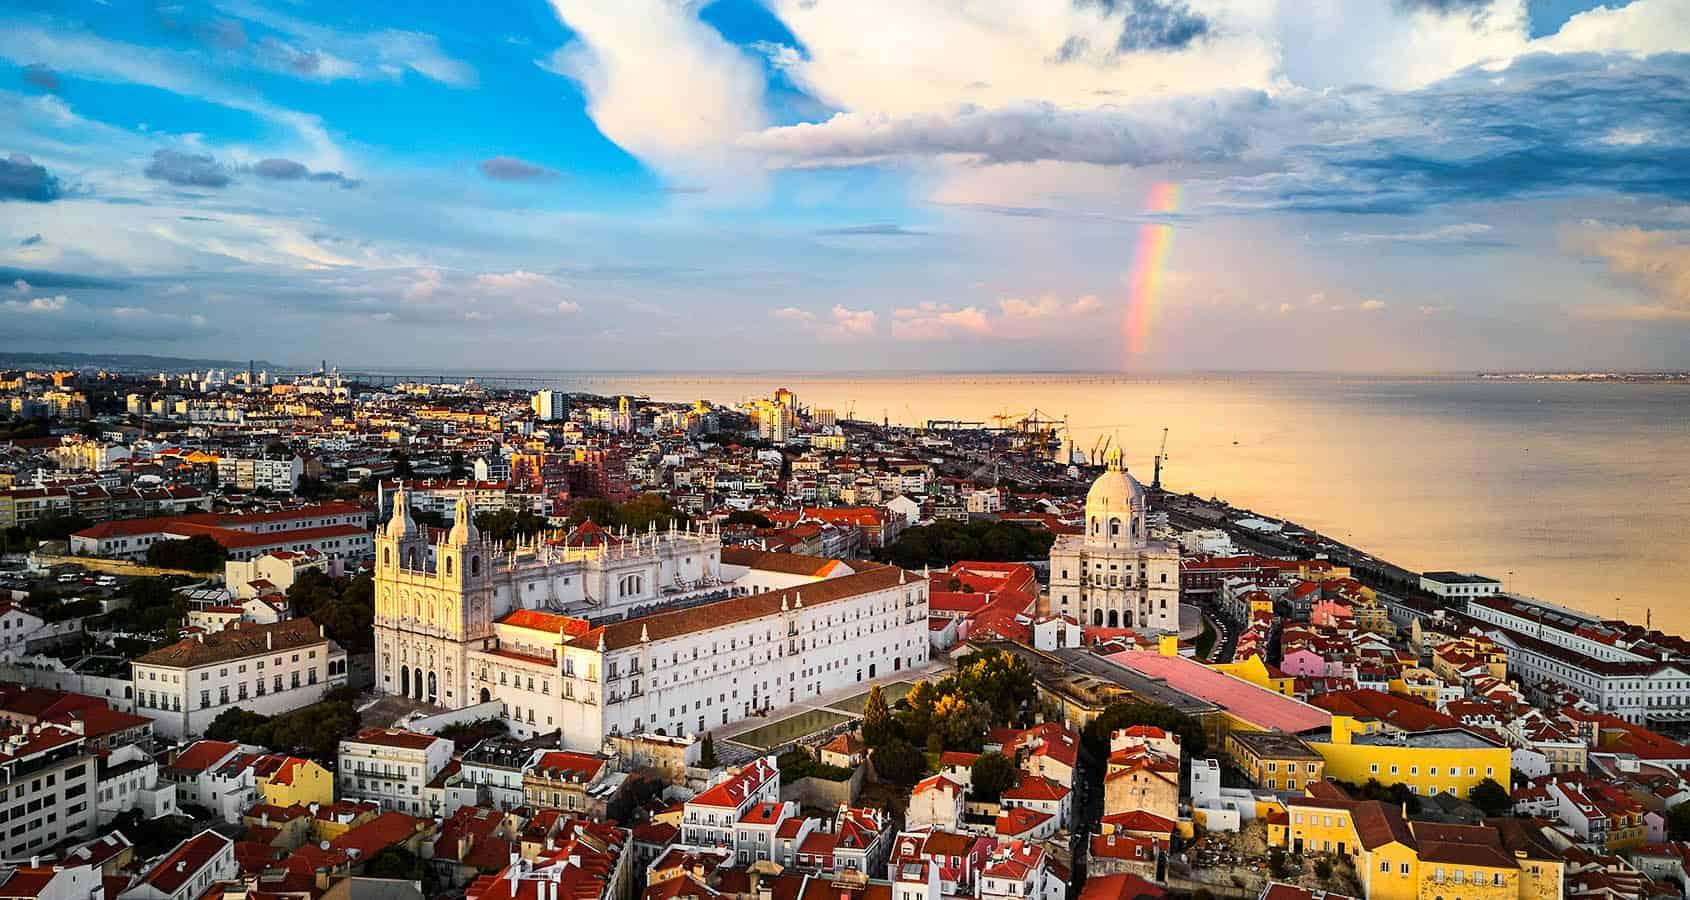 Fotboll: Höstcup i Lissabon